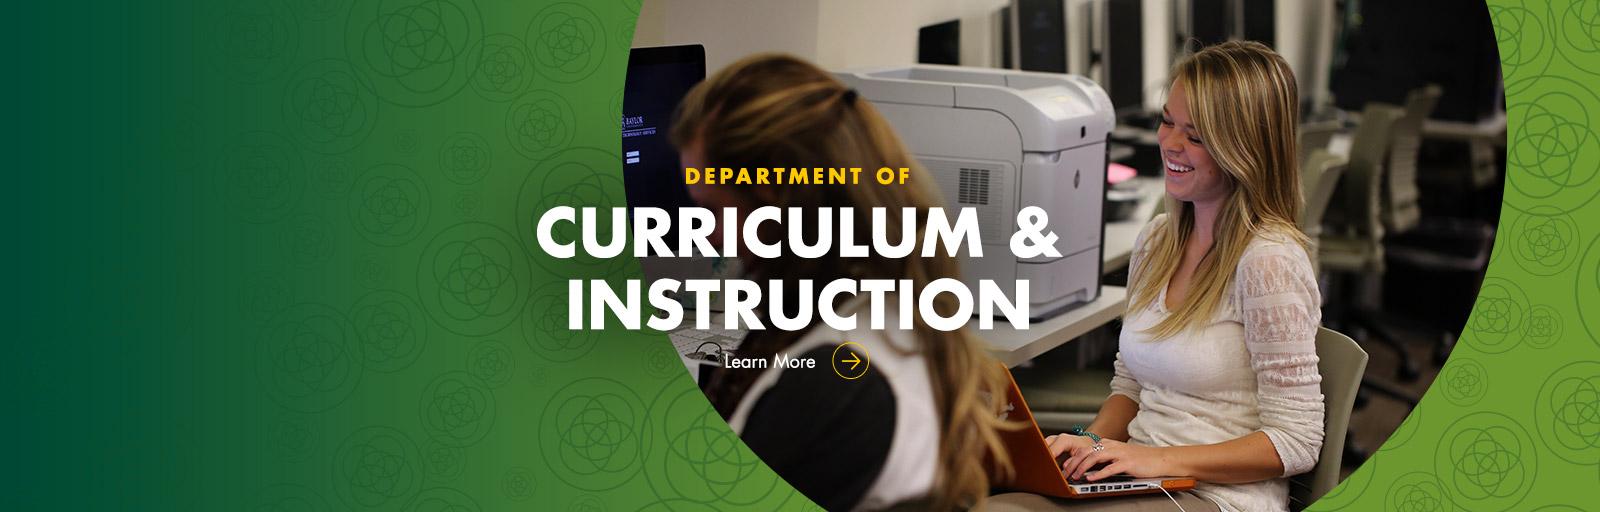 Curriclum Instruction Baylor University